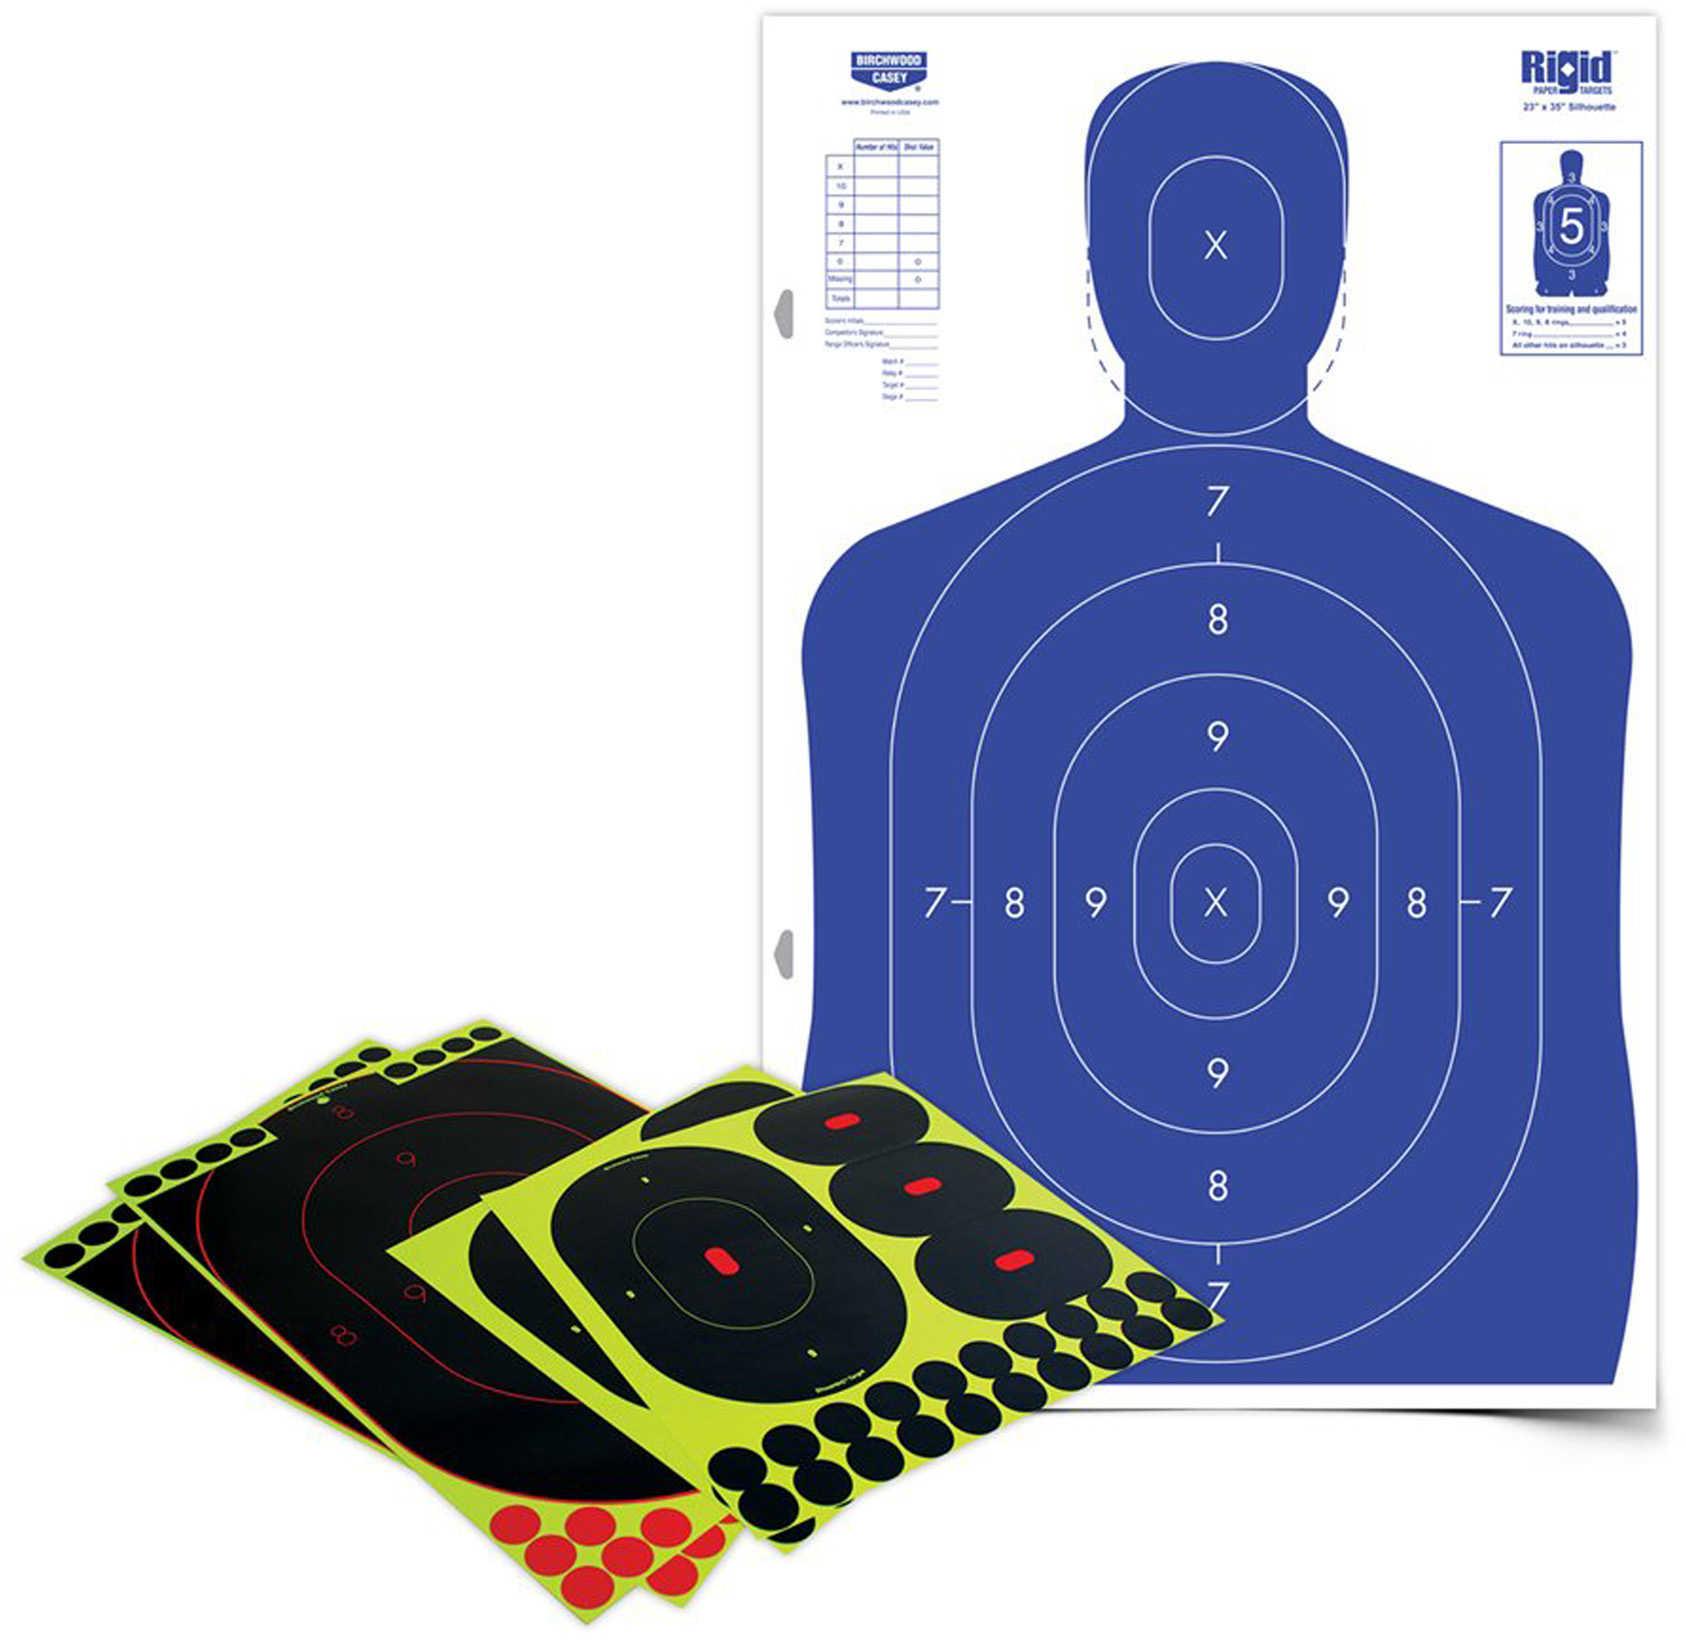 Birchwood Casey 34602 Shoot-N-C Silhouette Target Kit 1 Kit